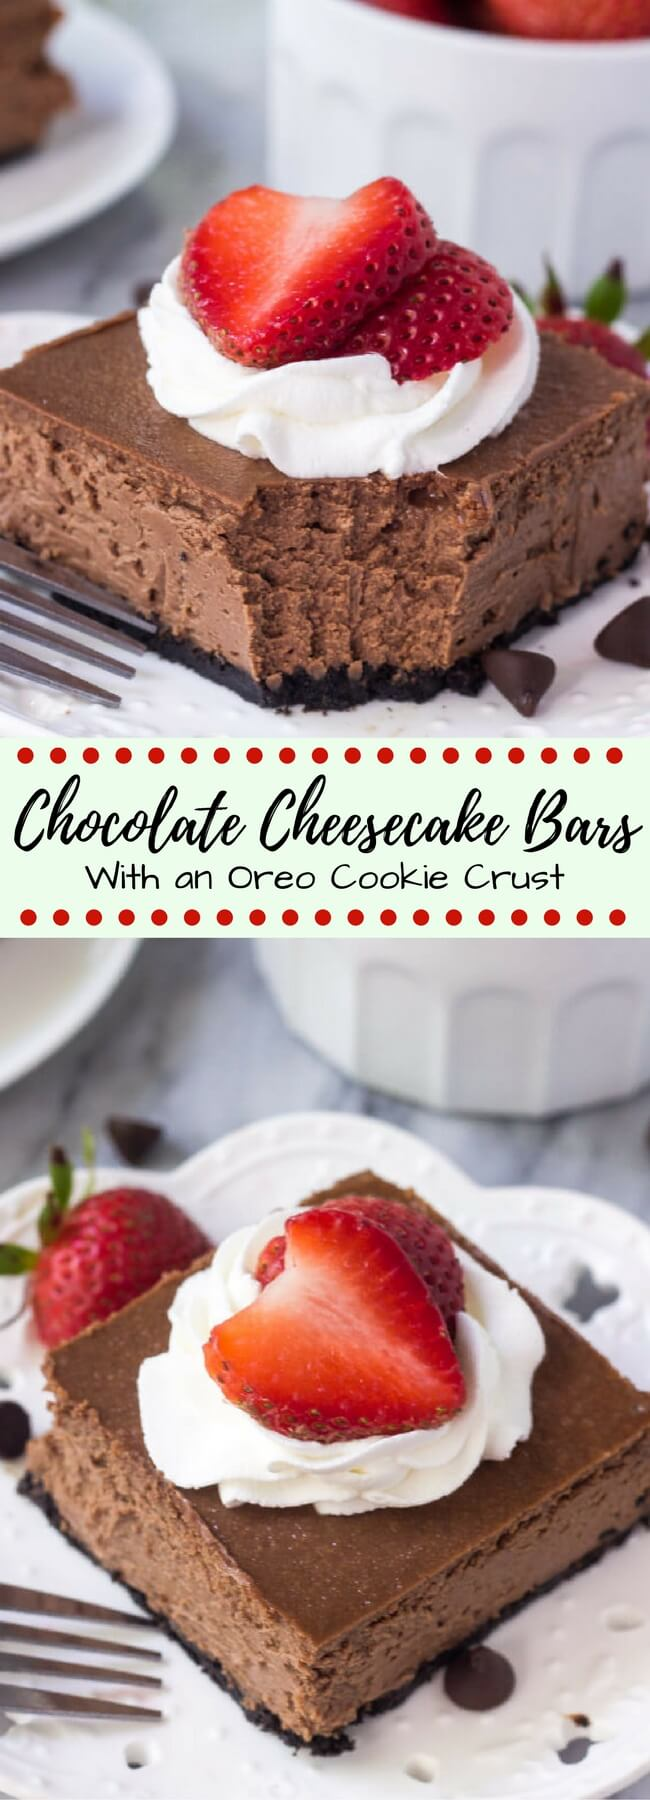 Chocolate Cheesecake Bars - Just so Tasty